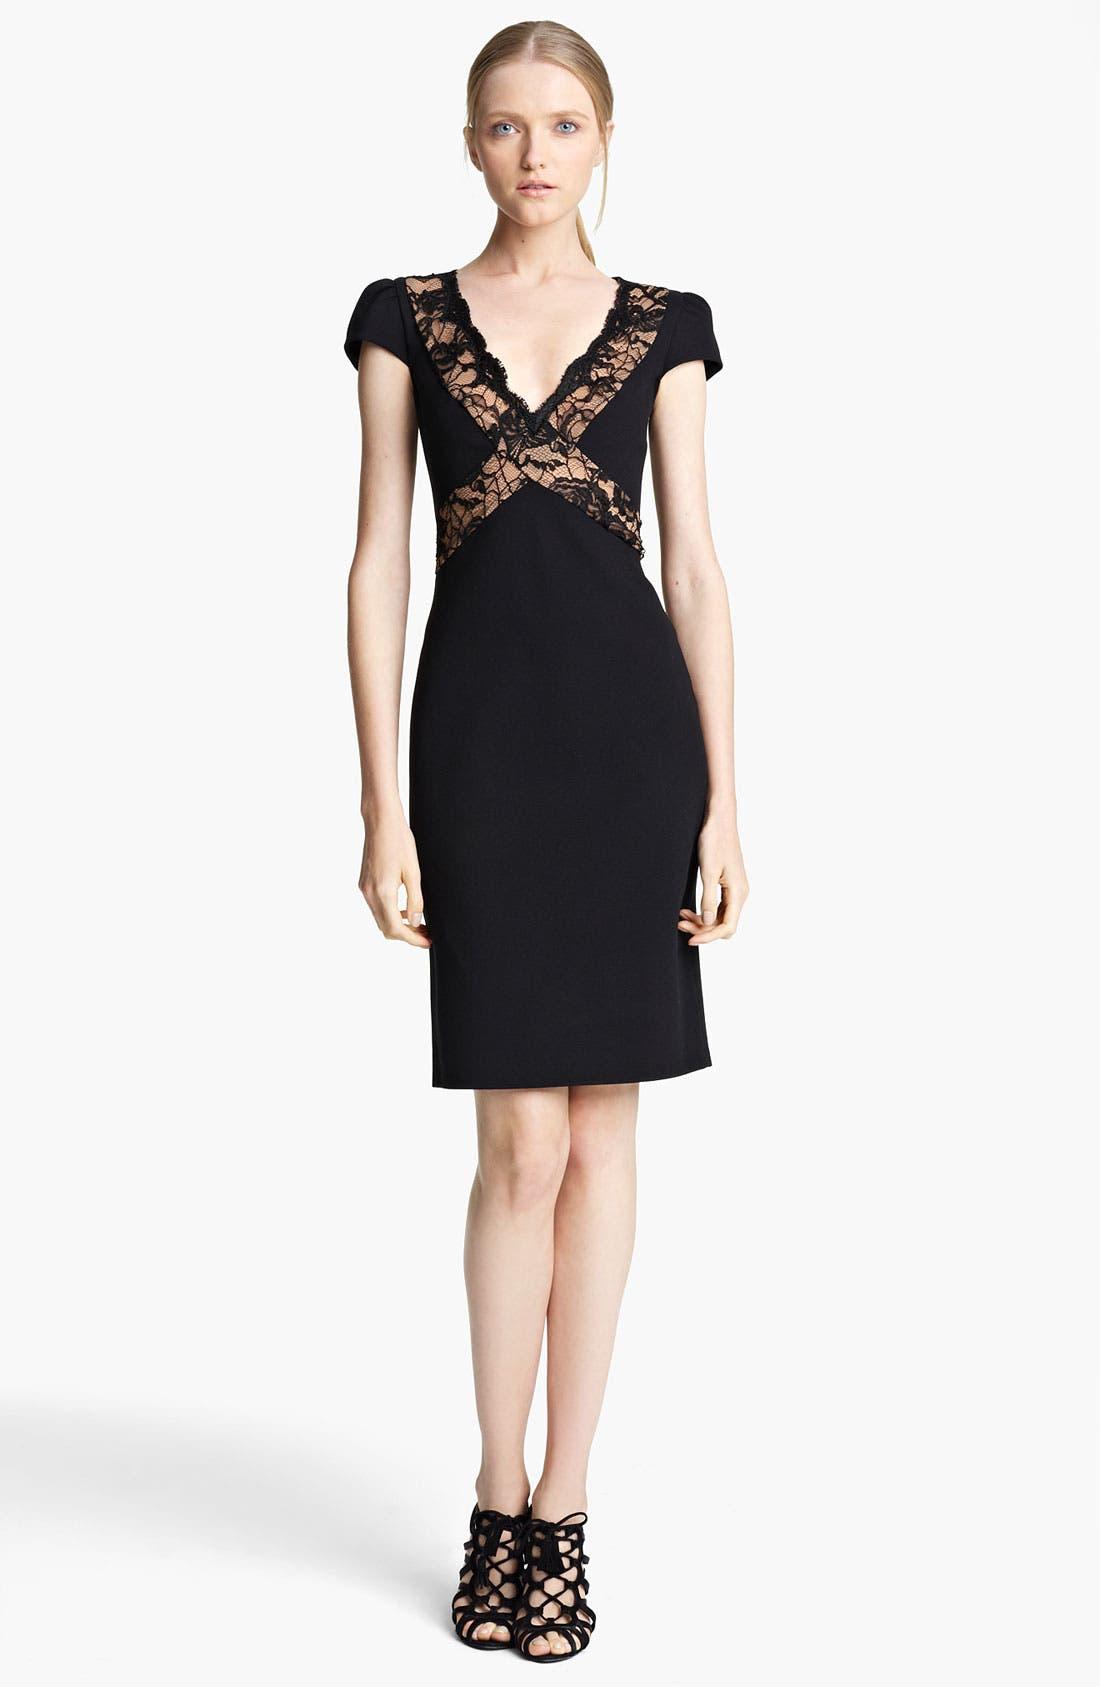 Main Image - Emilio Pucci Crisscross Lace Punto Milano Dress